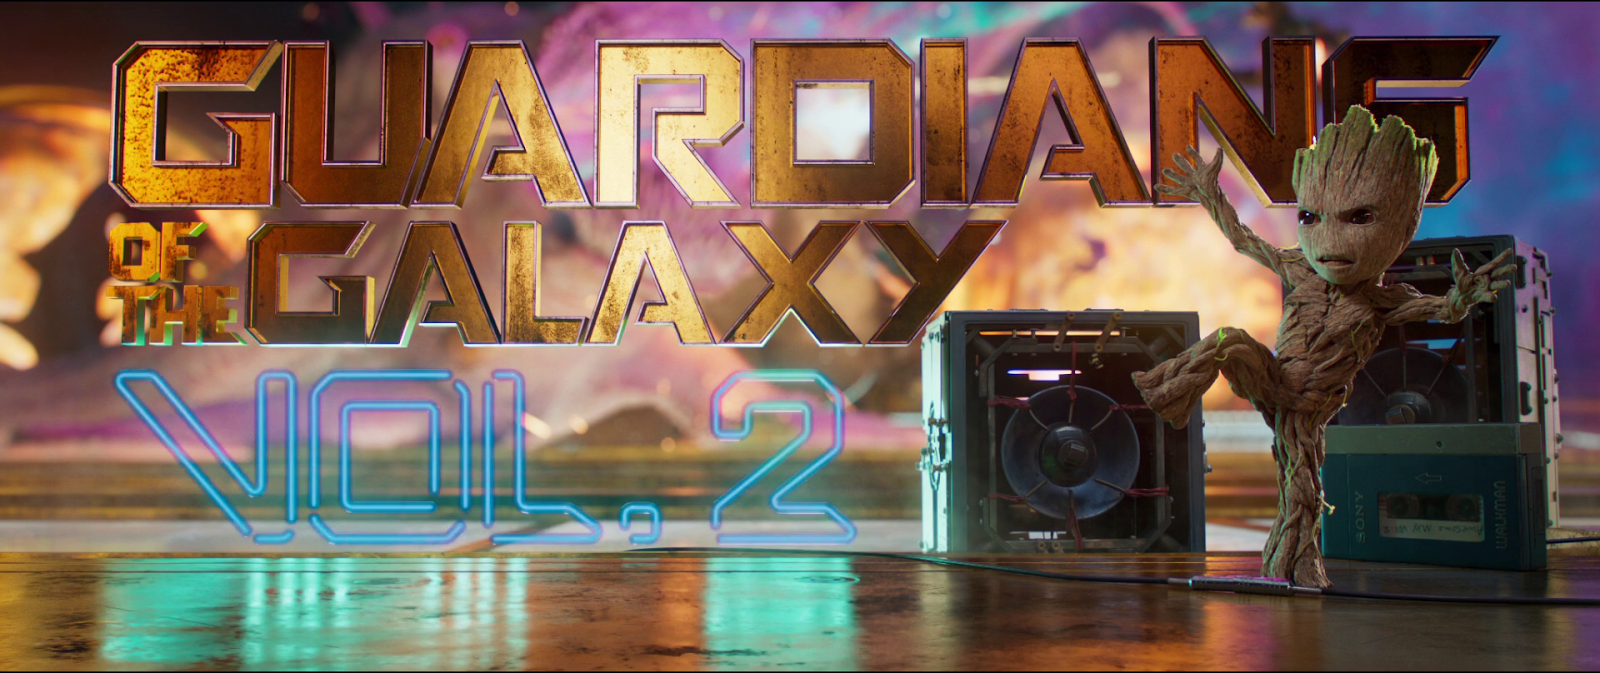 Guardianes de la galaxia Vol. 2 (2017) HD 1080p Latino - Ingles captura 3